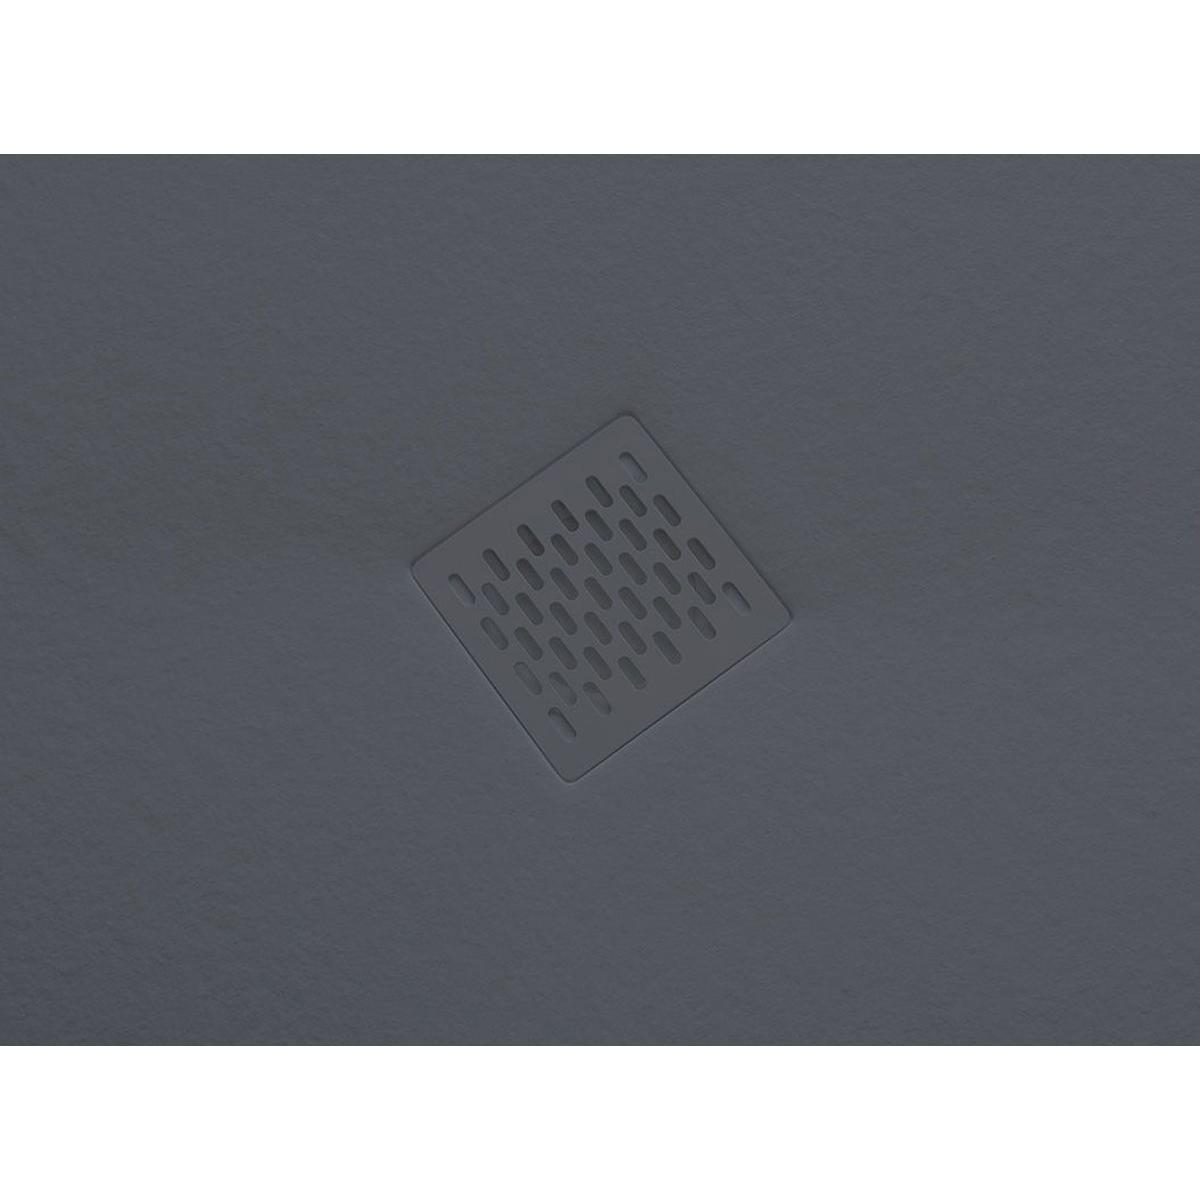 Plato de ducha rectangular 100x80 Ares Stone Nox Basalto